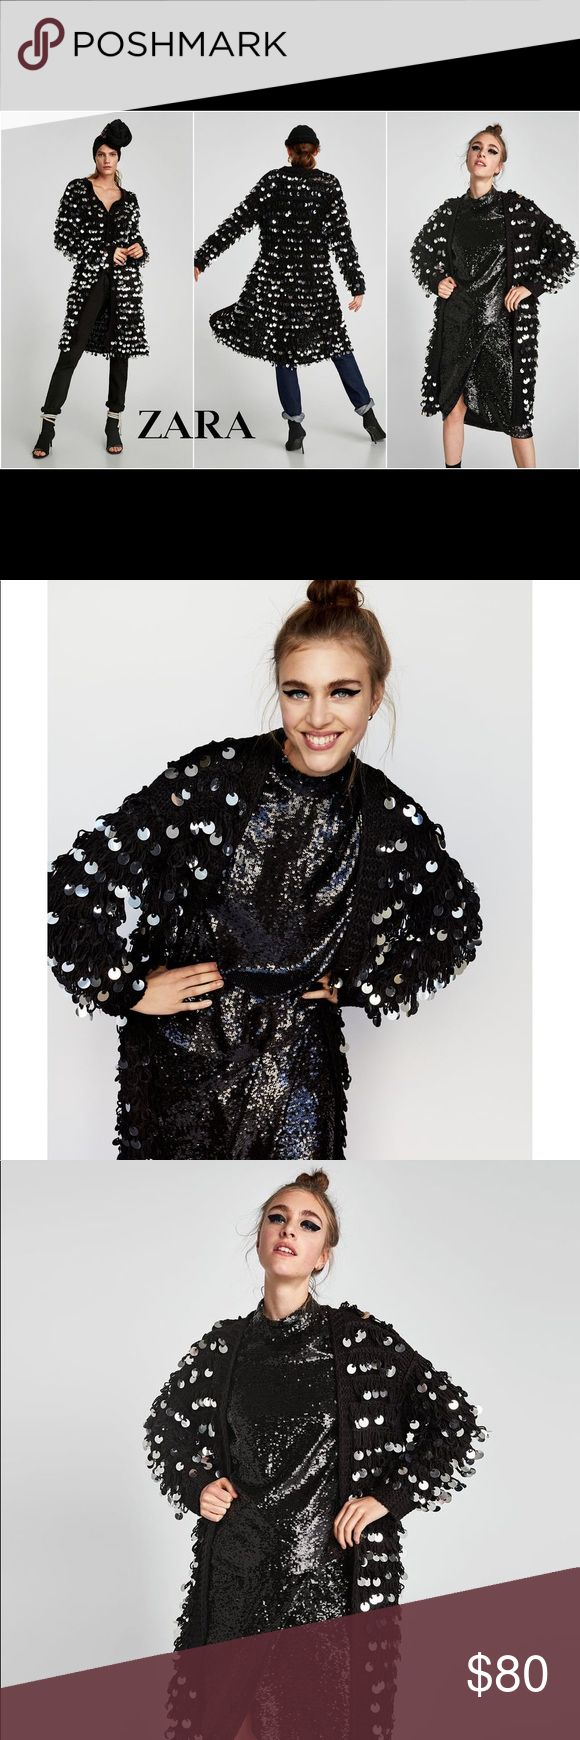 Zara knit coat Sequin coat will make a statement dress up or down Zara Jackets & Coats